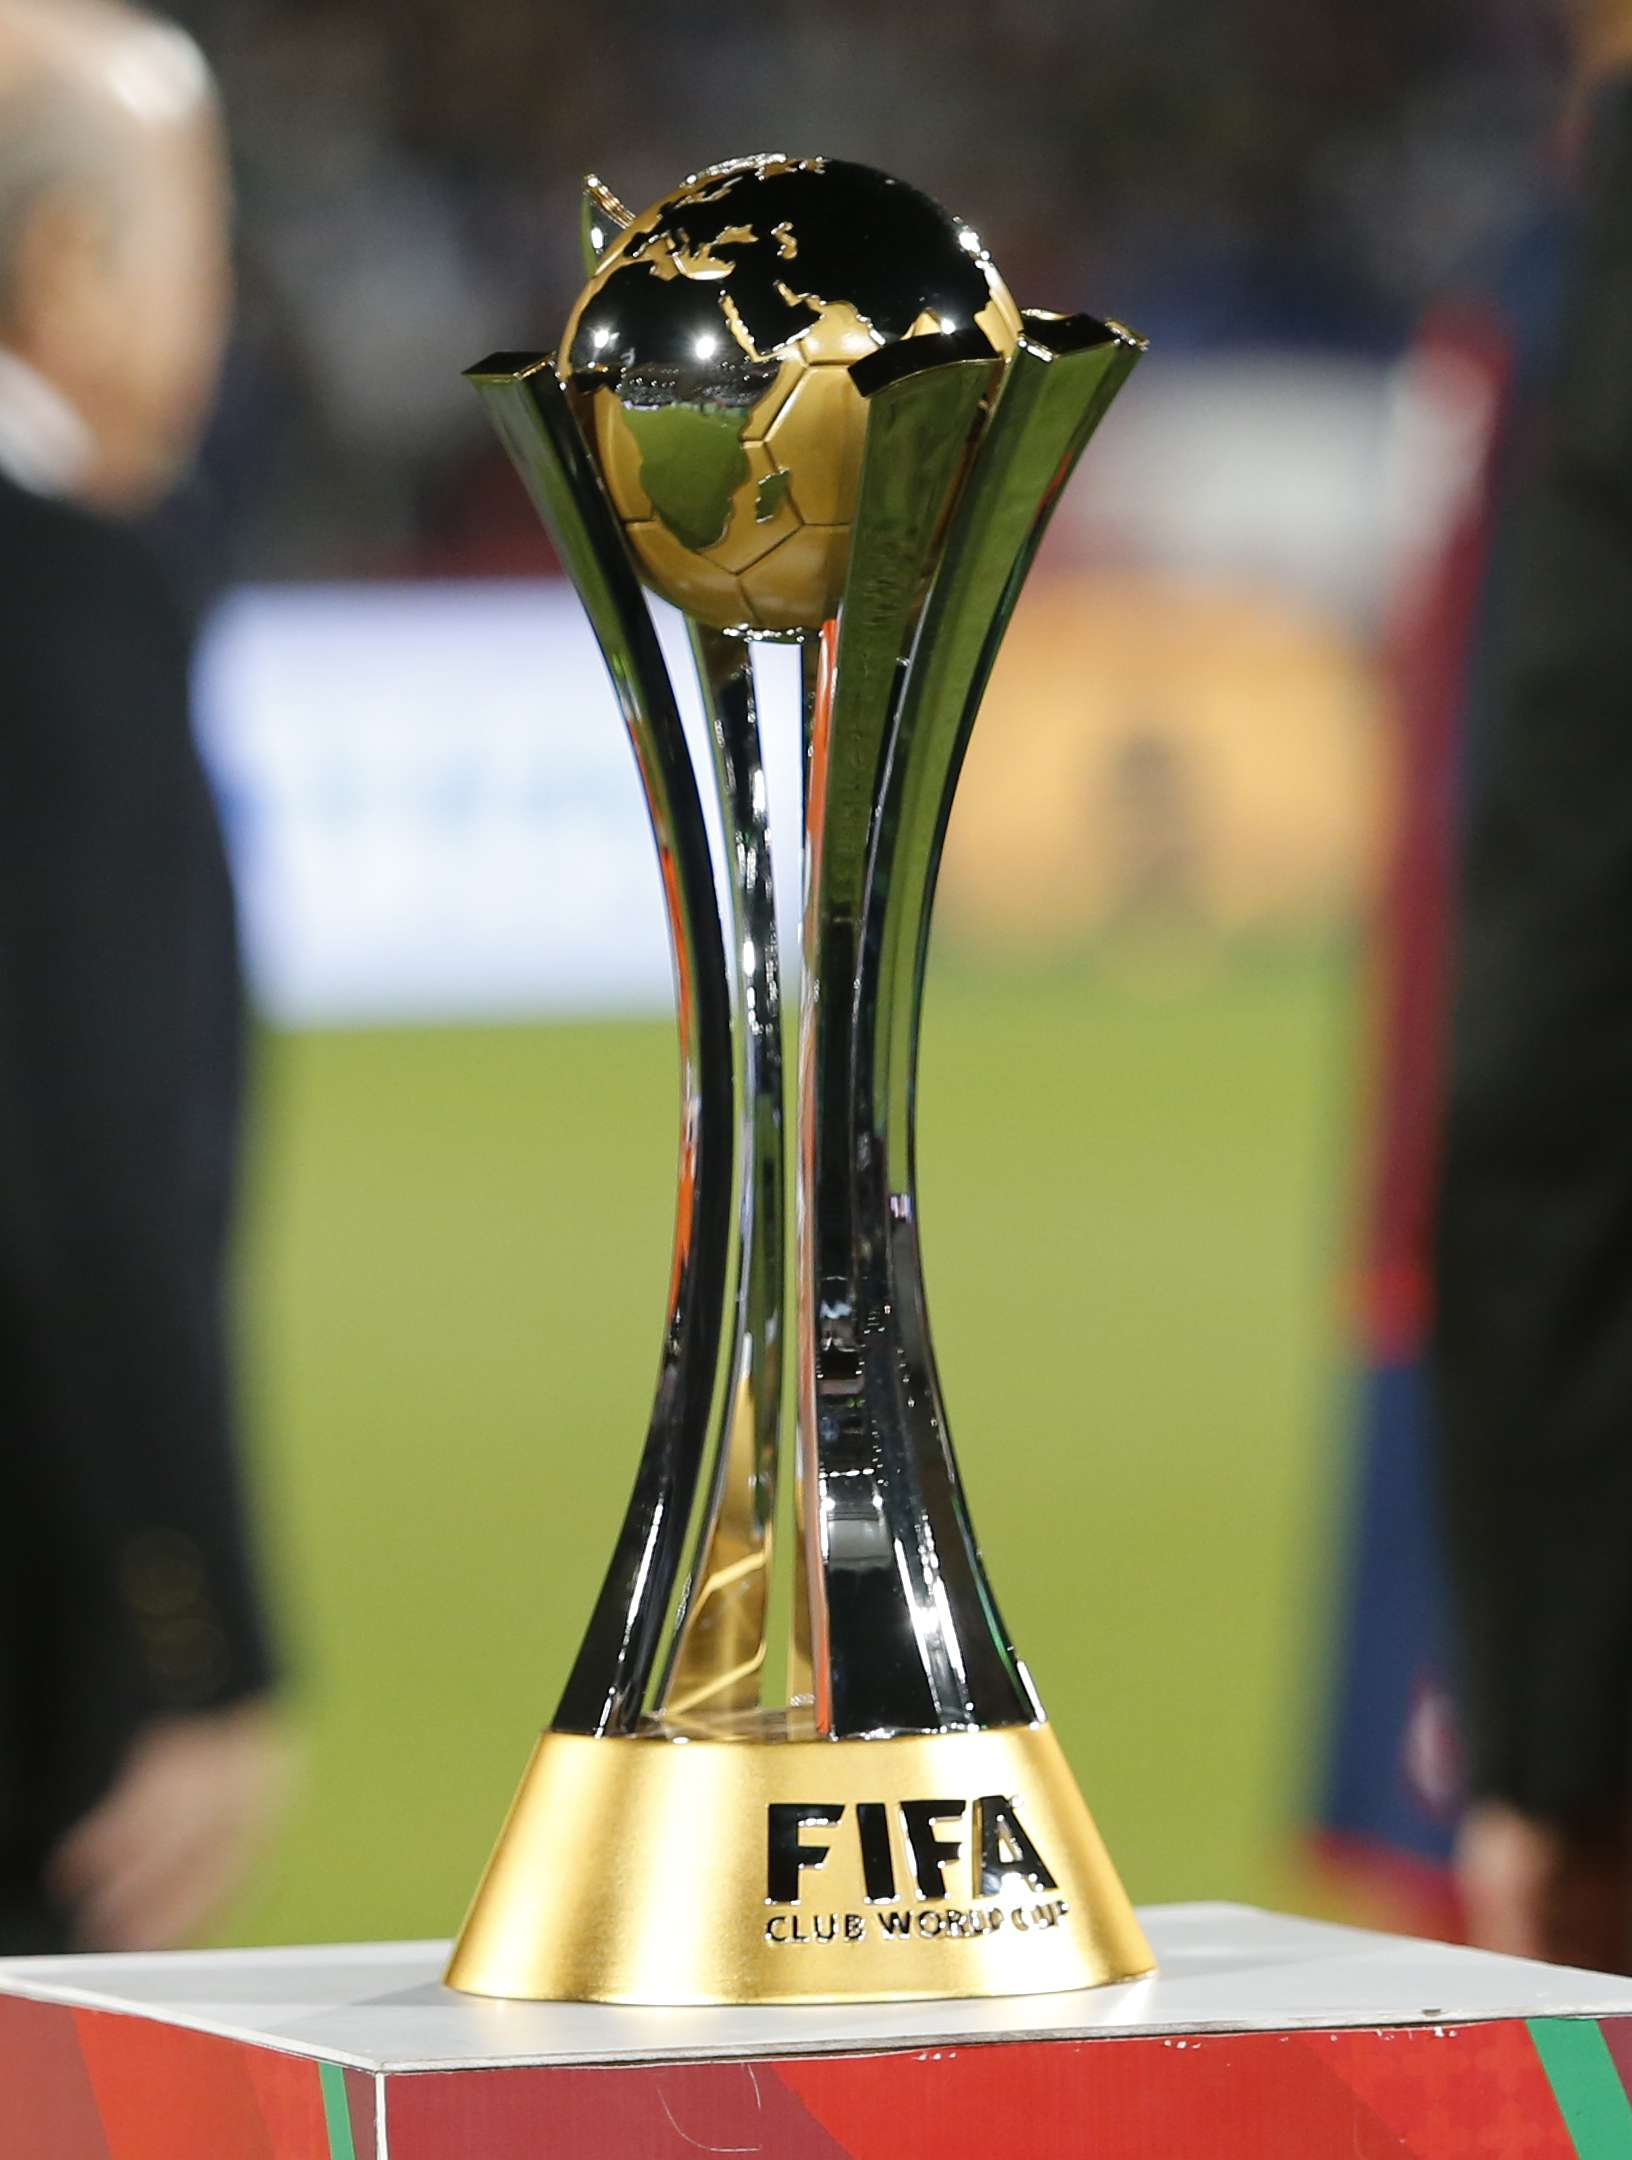 Taça do Mundial é exposta no gramado em final Foto: Abdeljalli Bounhar/AP